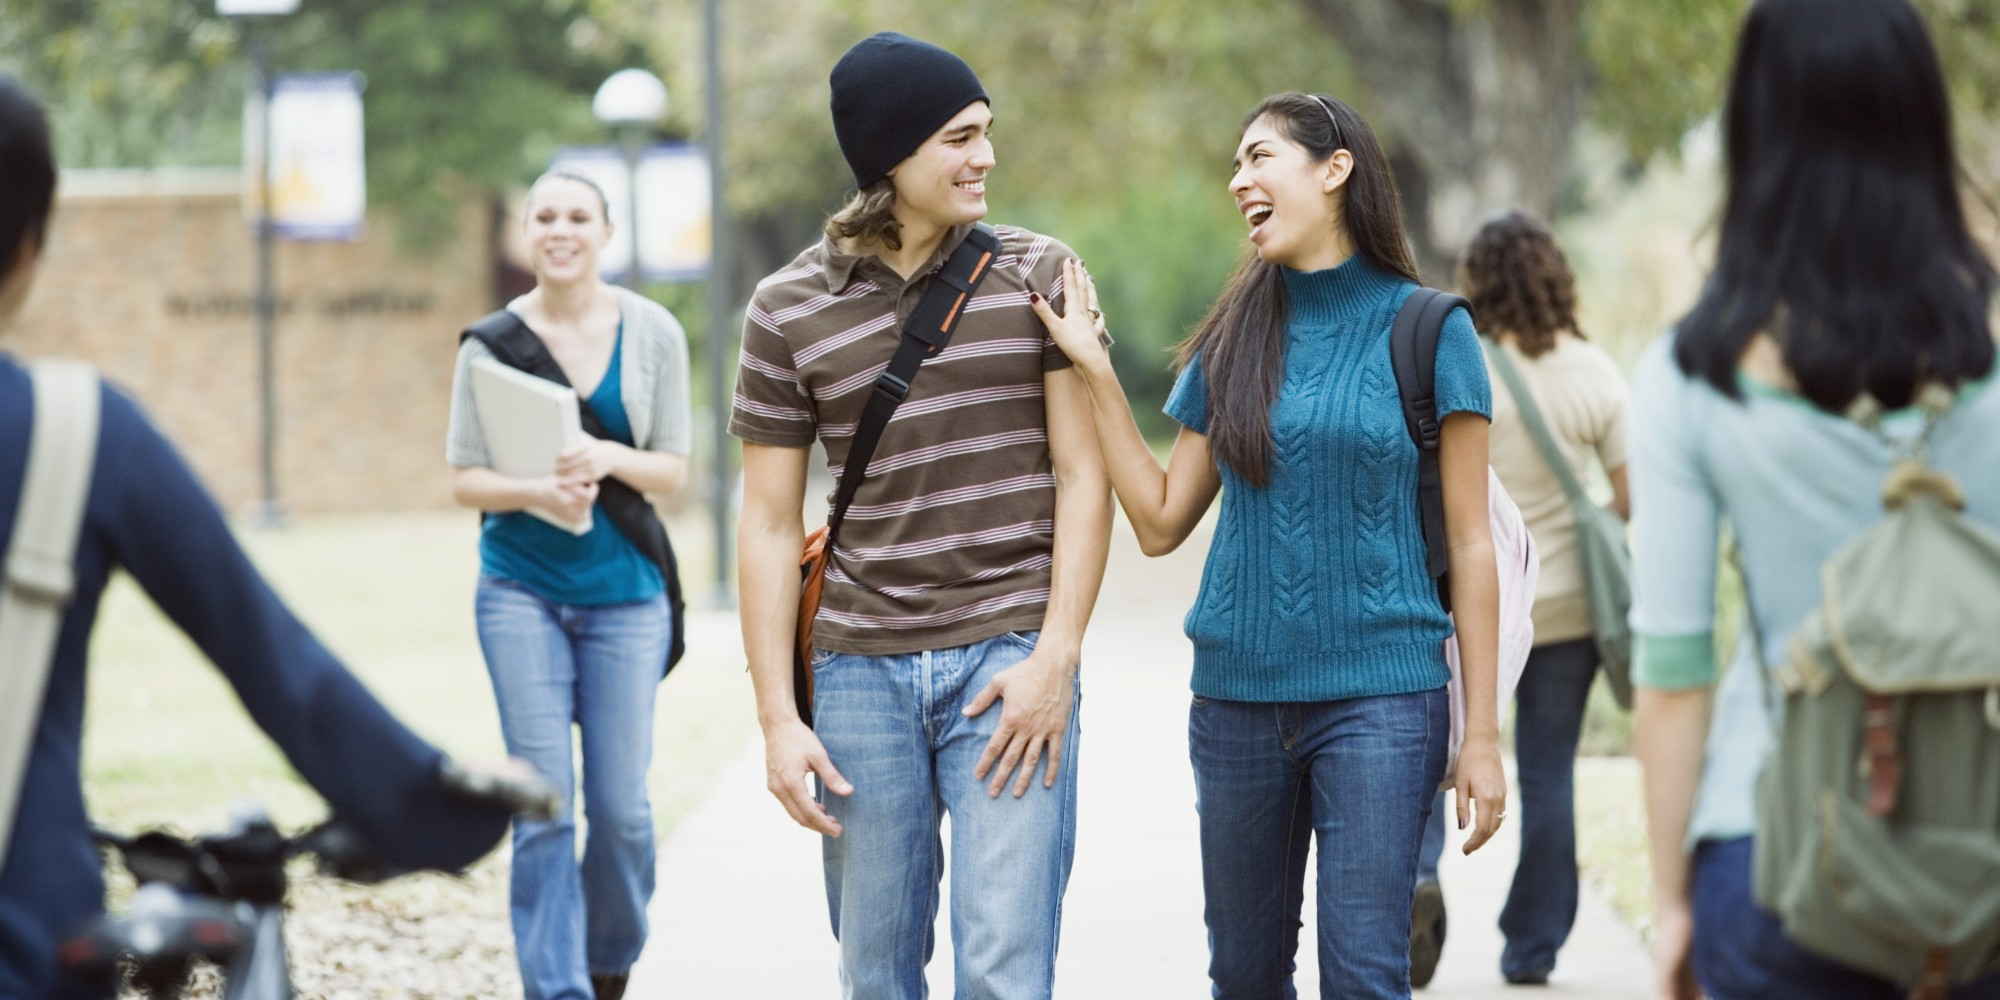 7 Ways To Make College Visits More Fun